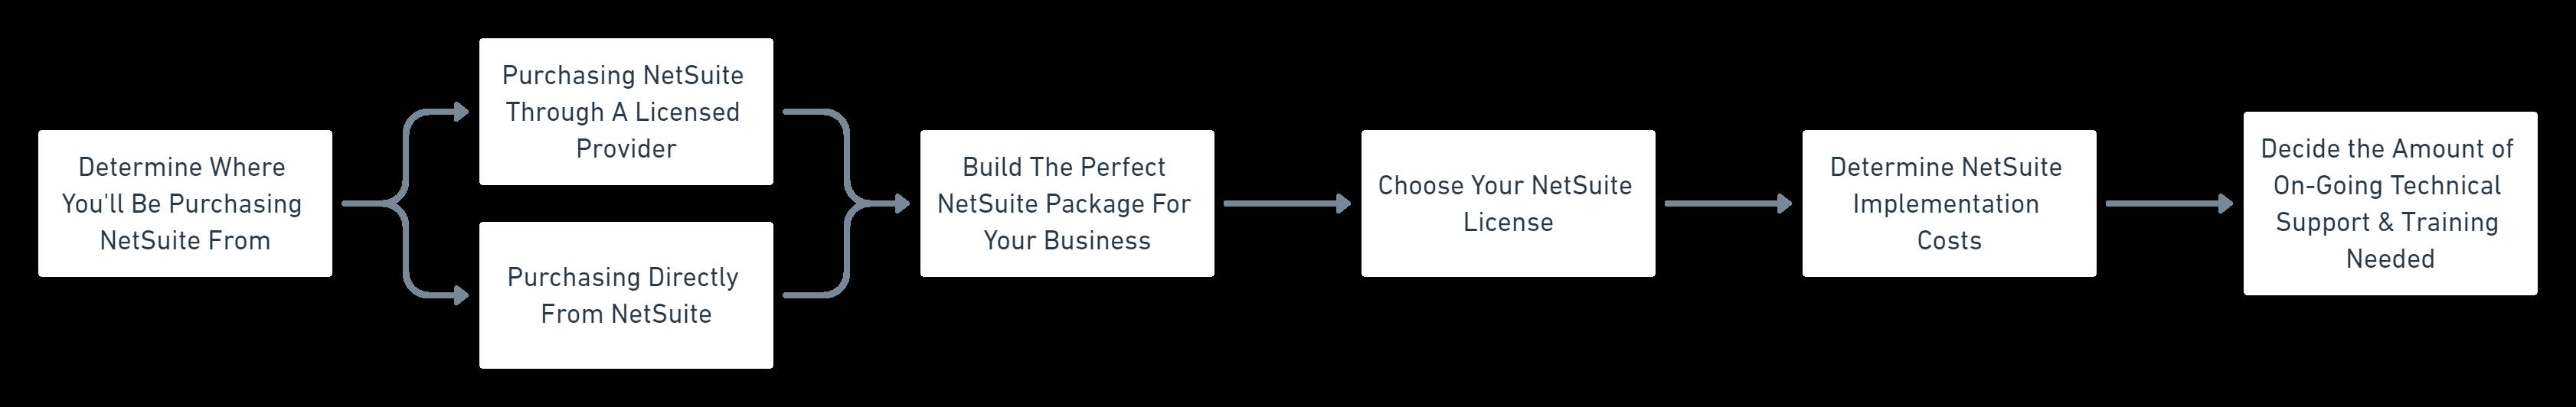 NetSuite Purchase Flowchart